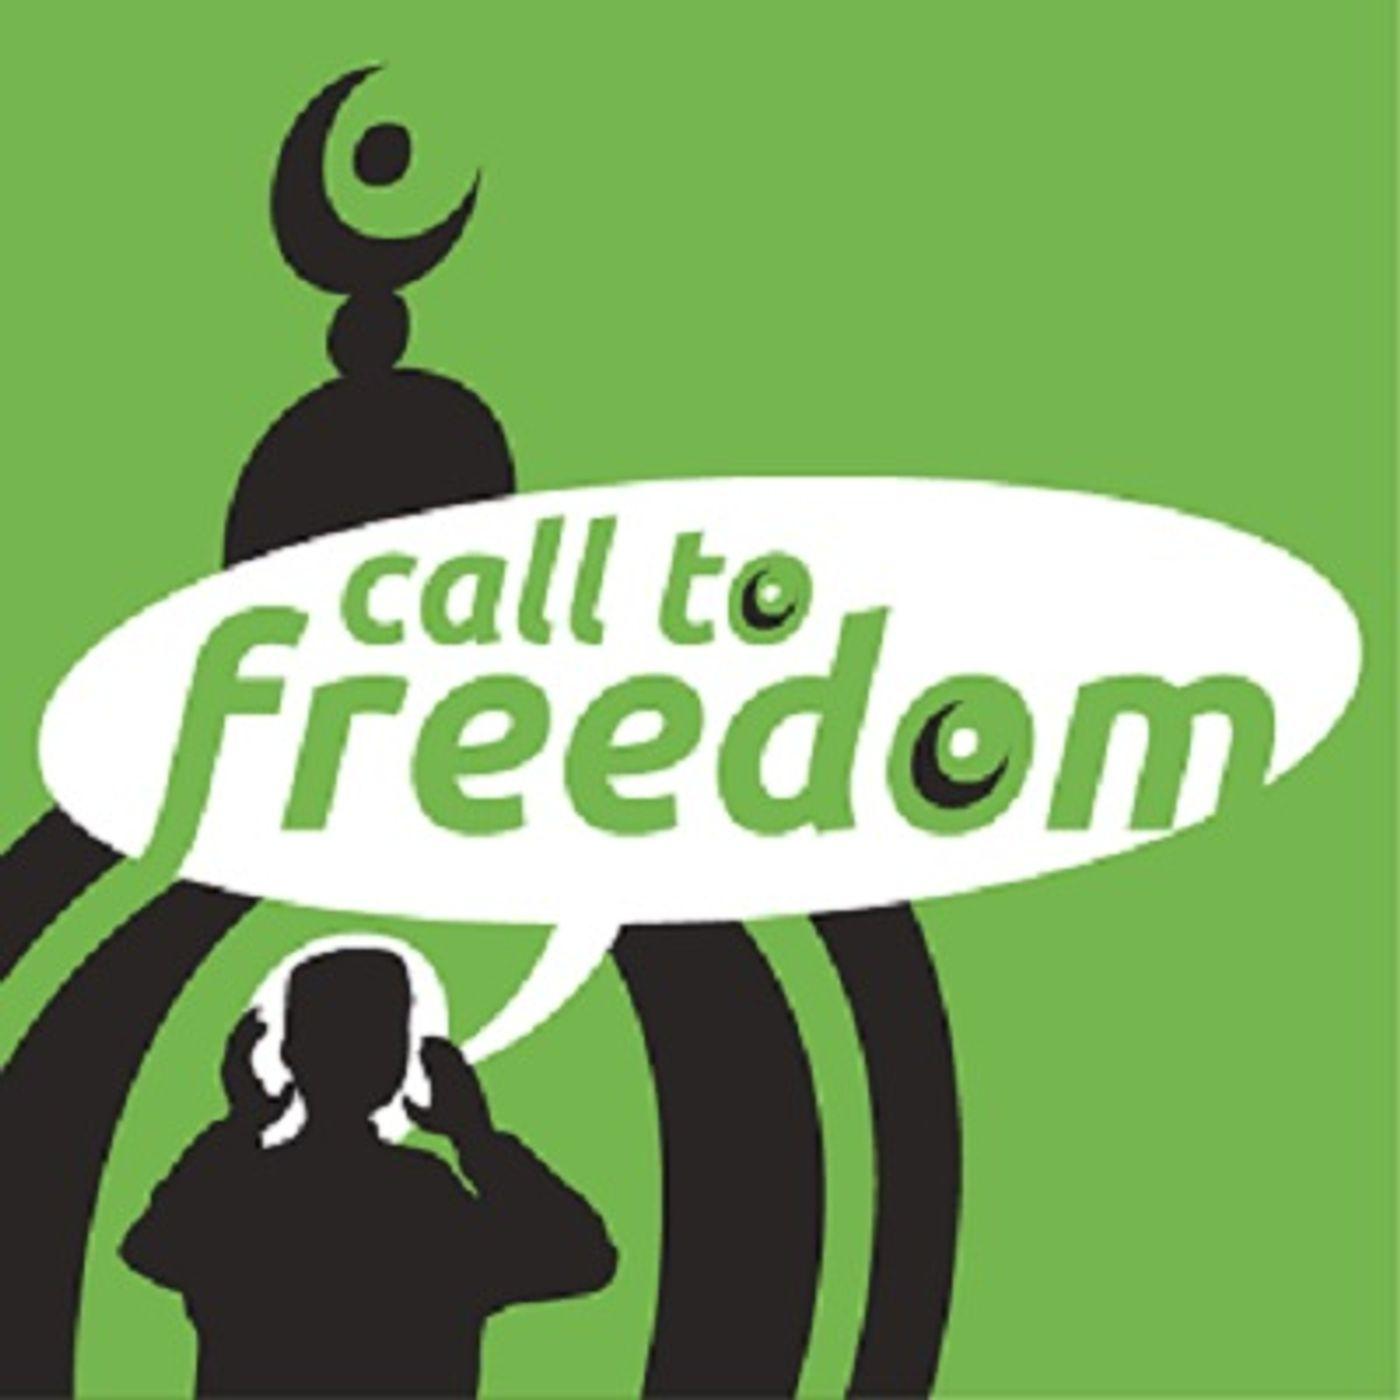 Heartland Newsfeed Radio Network: The Call To Freedom (July 14, 2019)